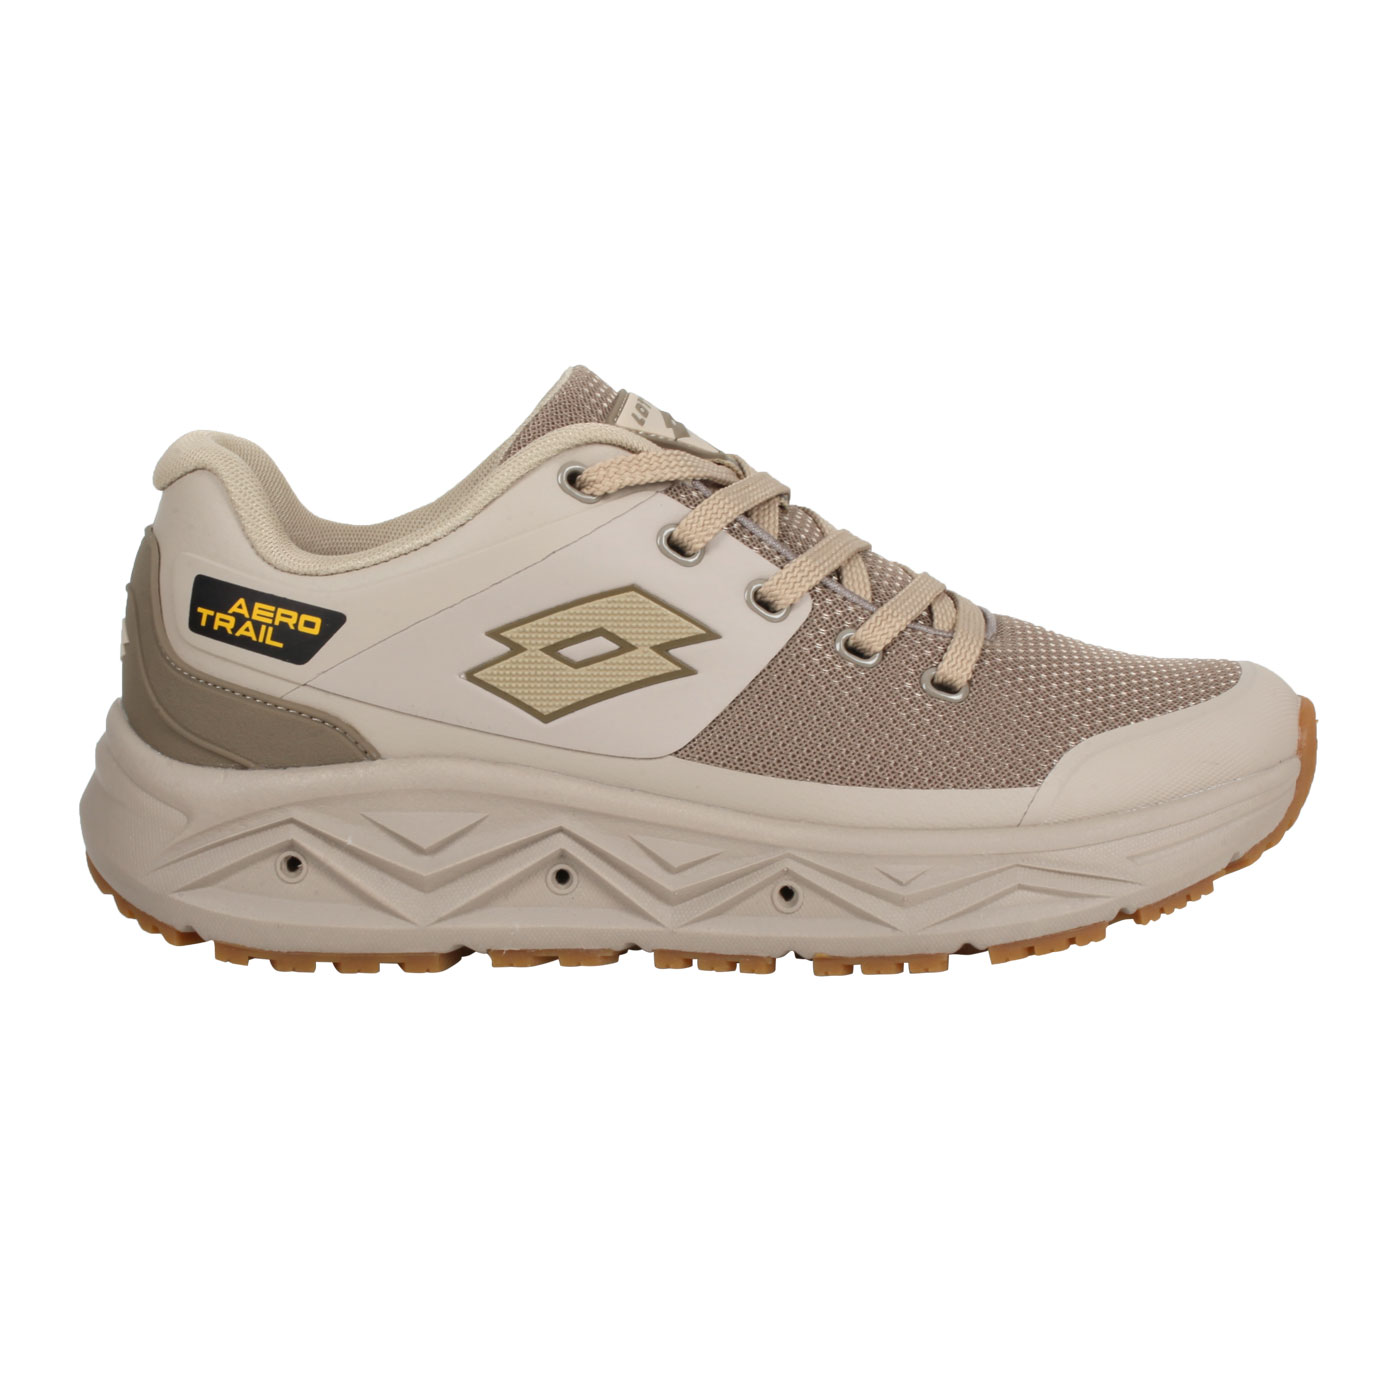 LOTTO 男款透氣越野跑鞋 LT1AMR3601